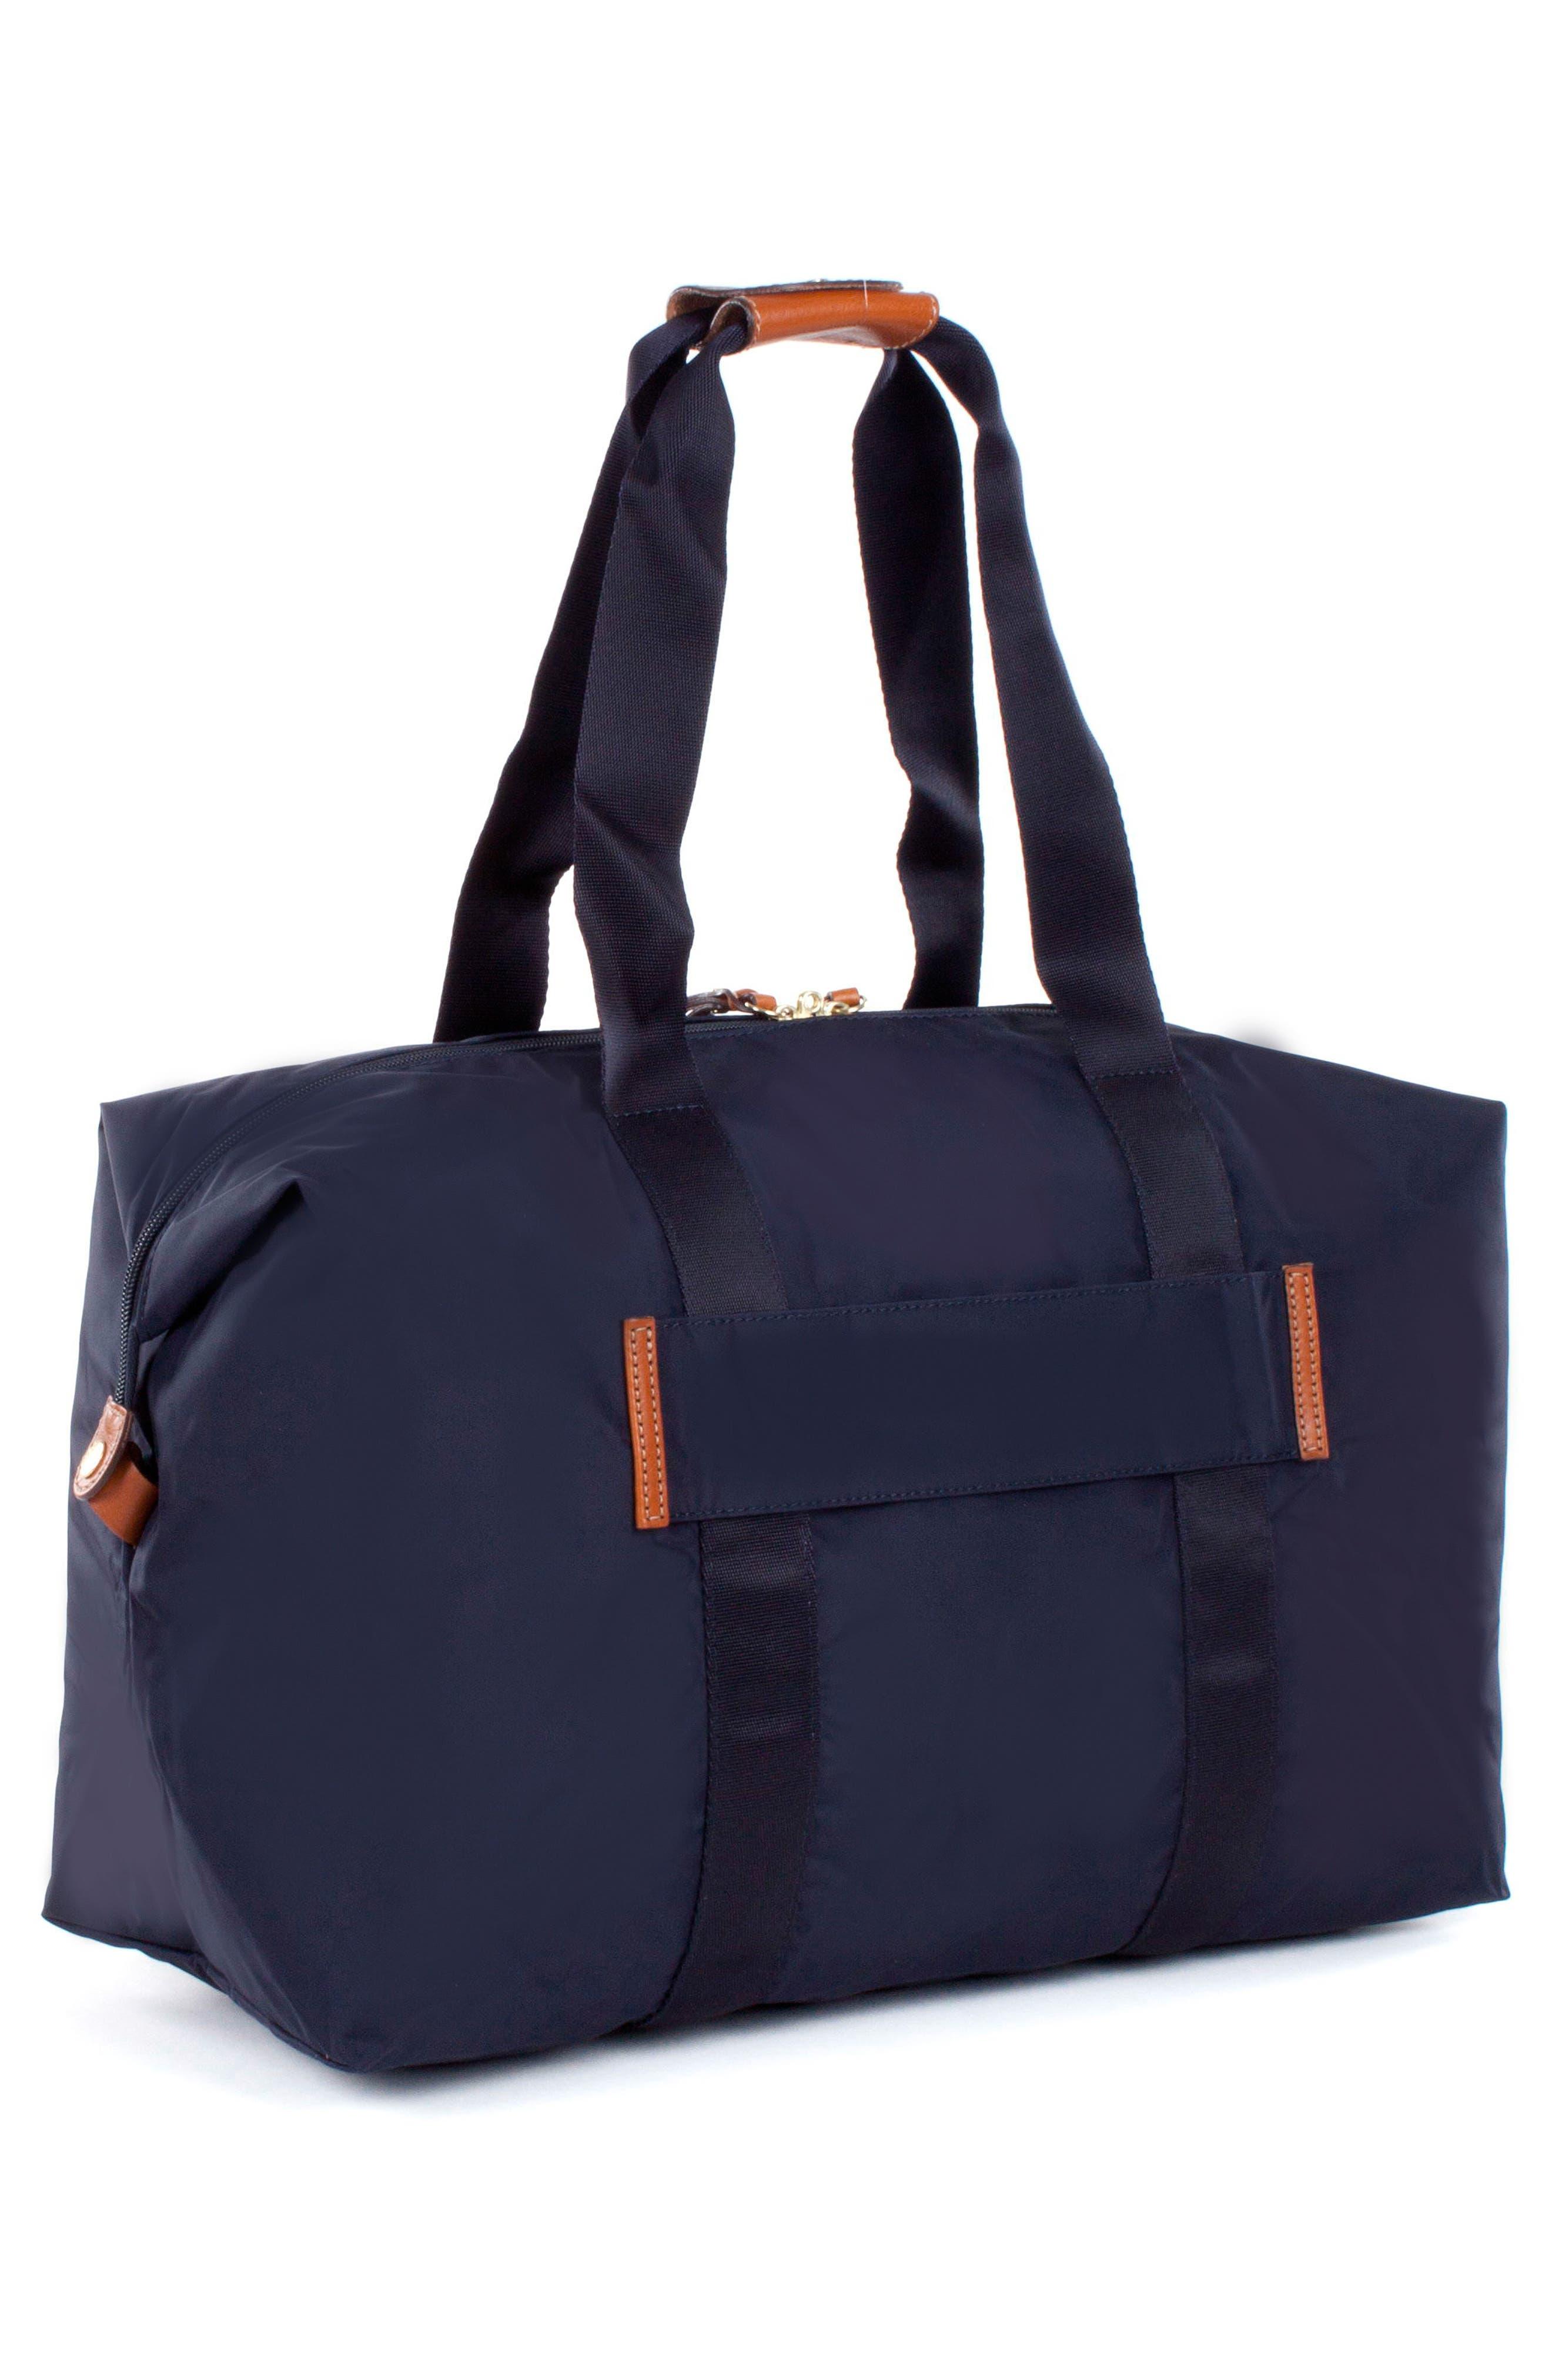 'X-Bag' Folding Duffel Bag,                             Alternate thumbnail 5, color,                             410